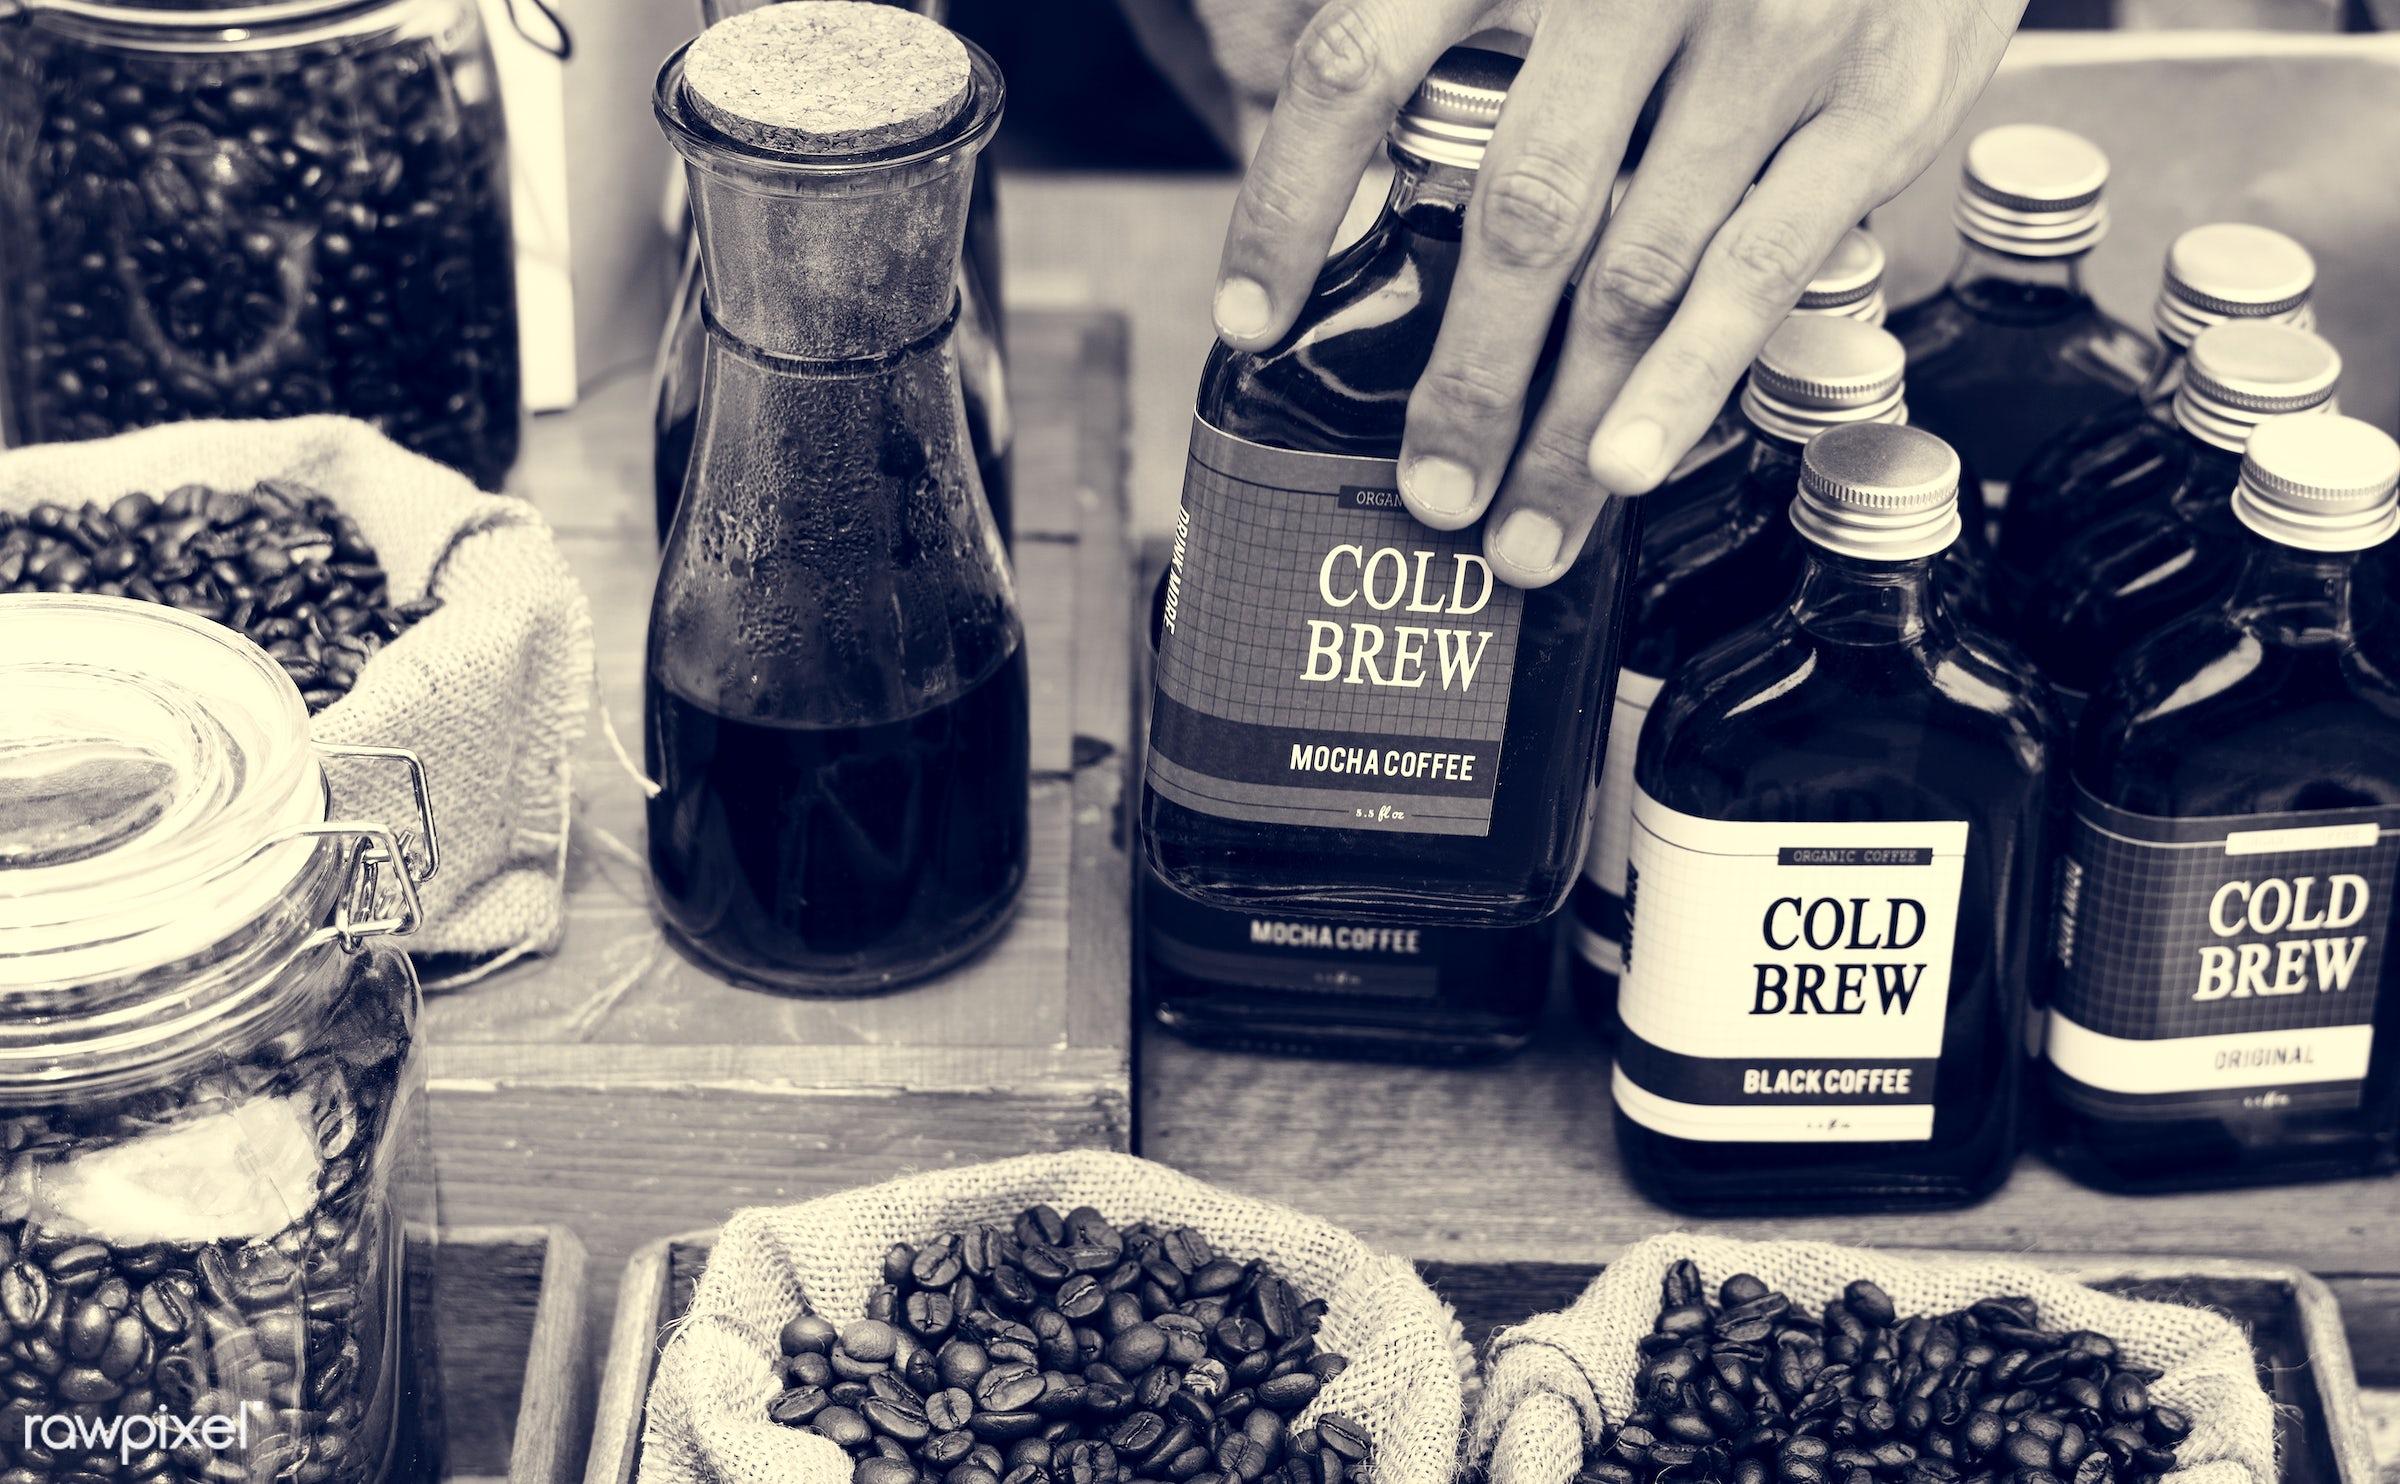 raw, shop, aroma, caffeine, aromatic, stall, business, arabica, coffe, nature, fresh, brew, blend, gourmet, bean, espresso,...